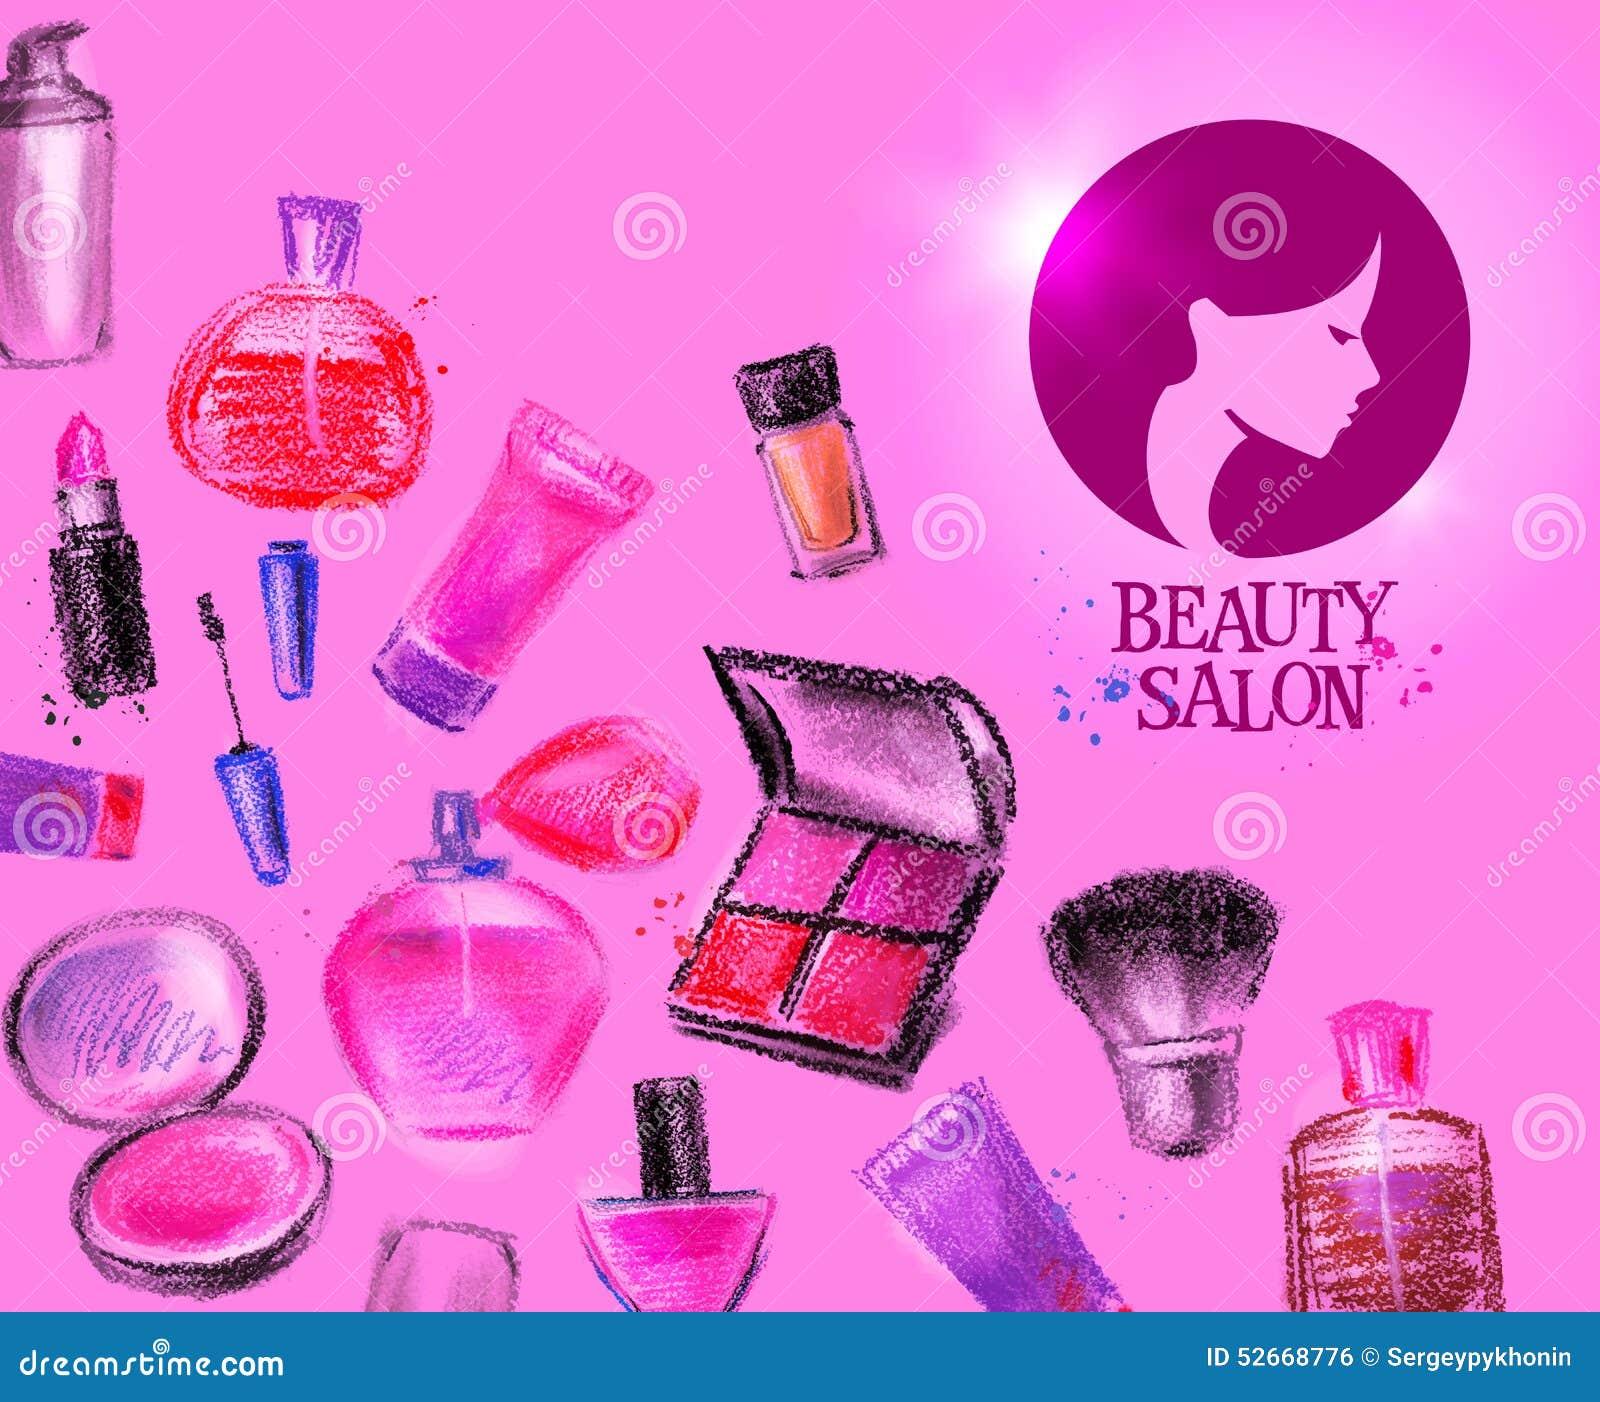 SPA MALL  Intelligent Beauty Solution  888 6881878